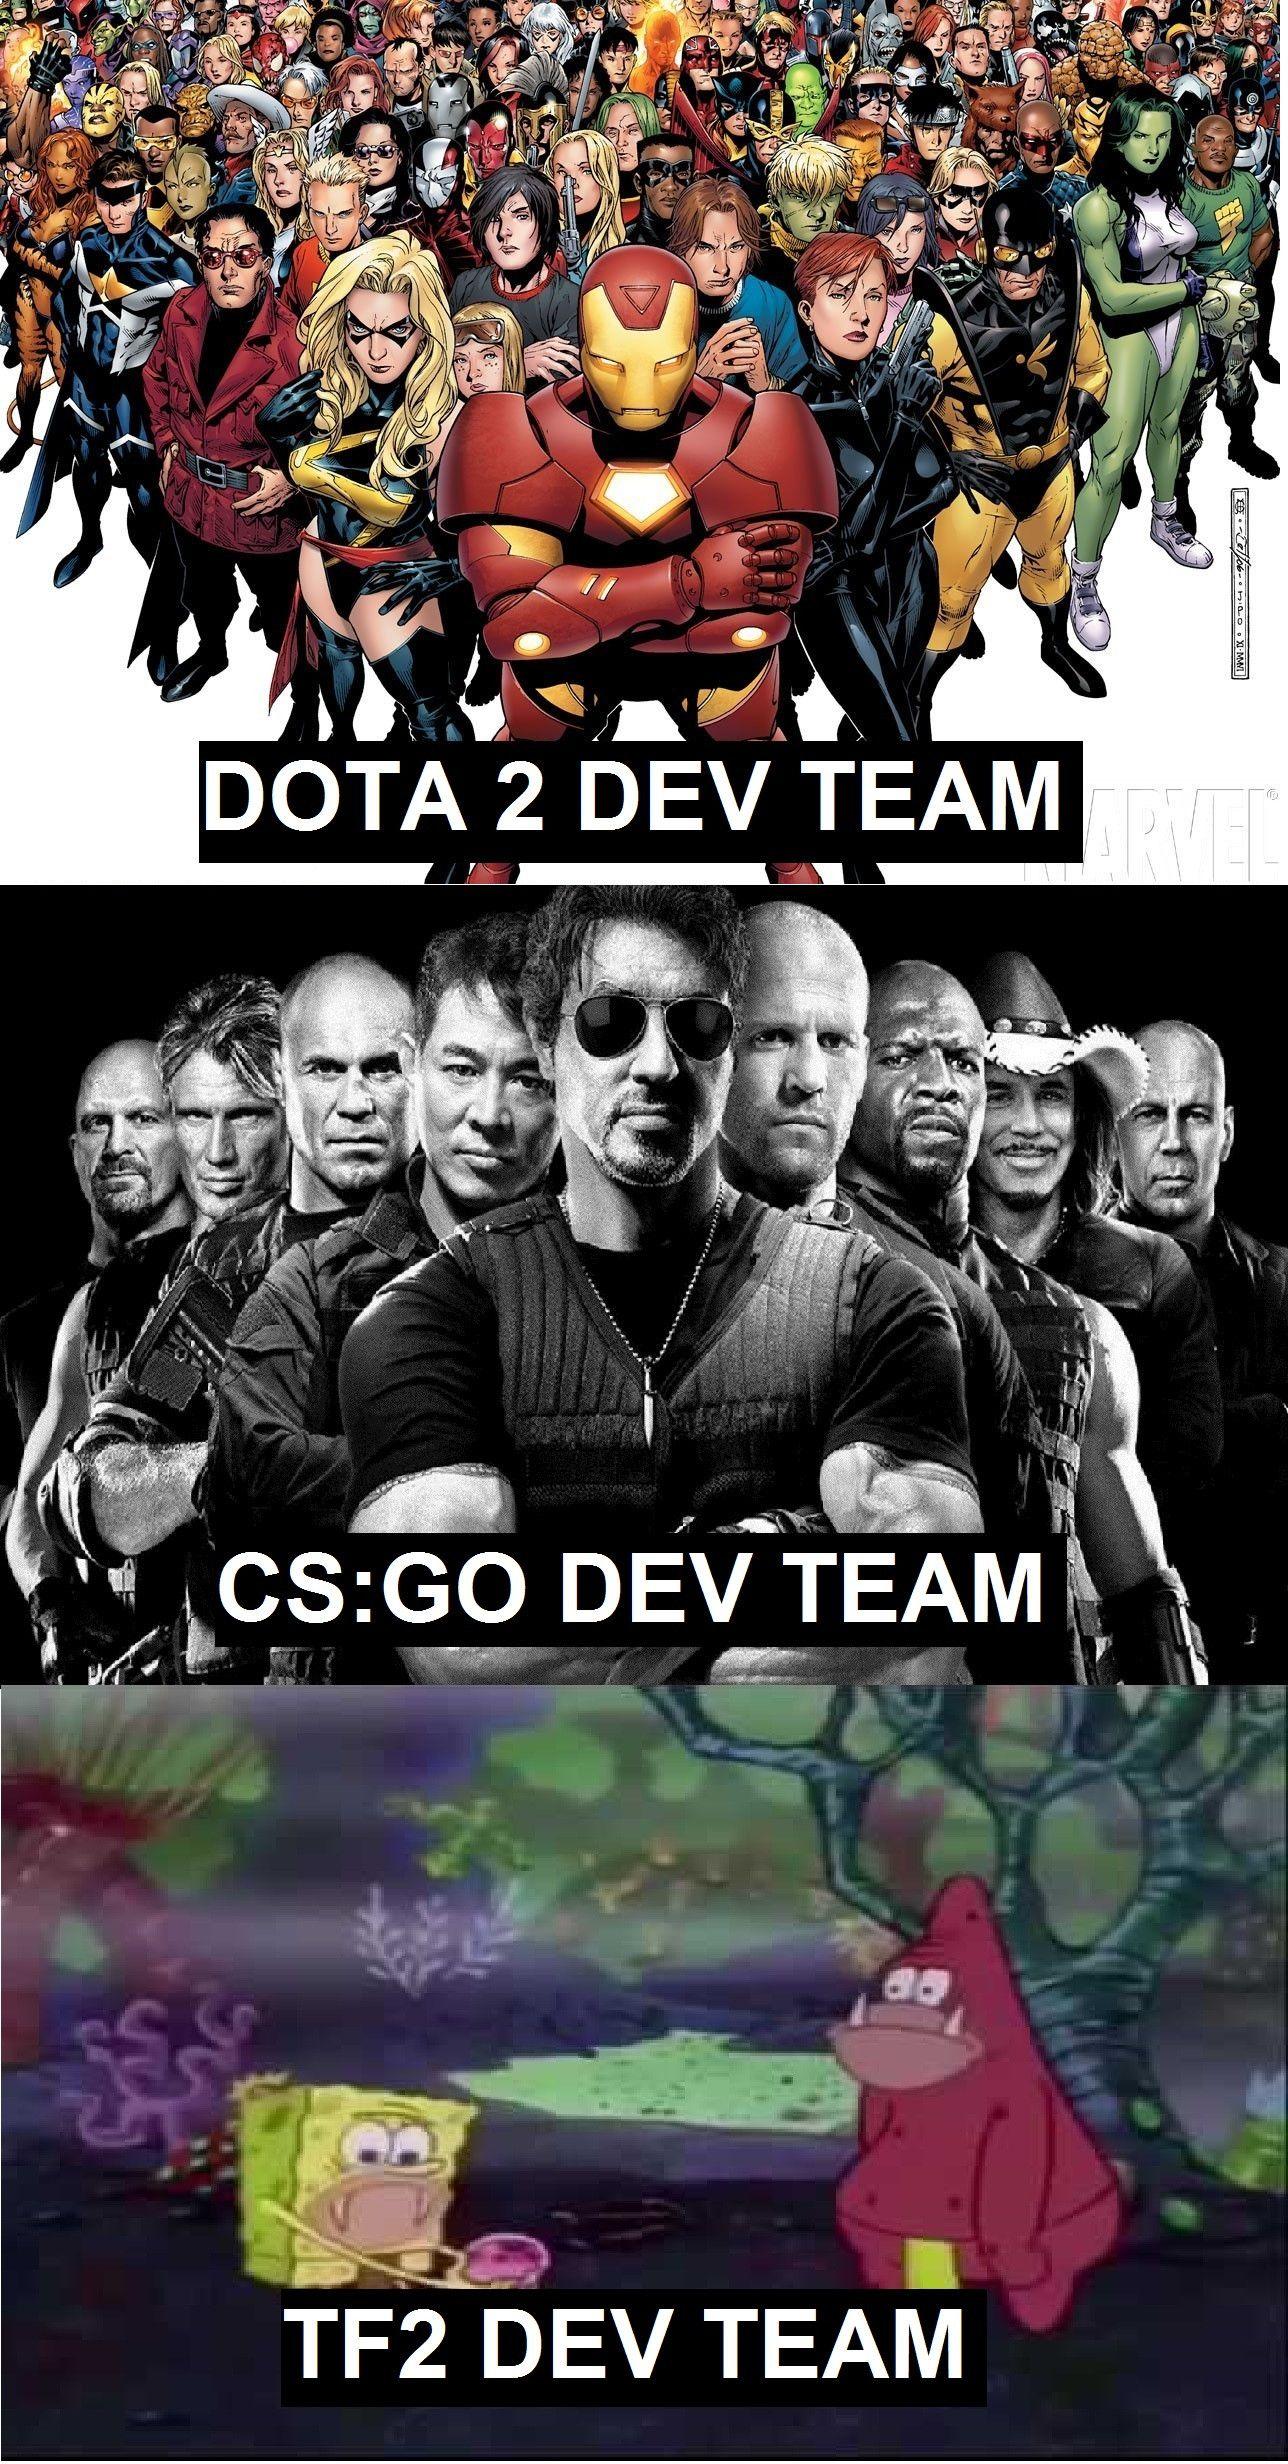 valve development team games teamfortress2 steam tf2